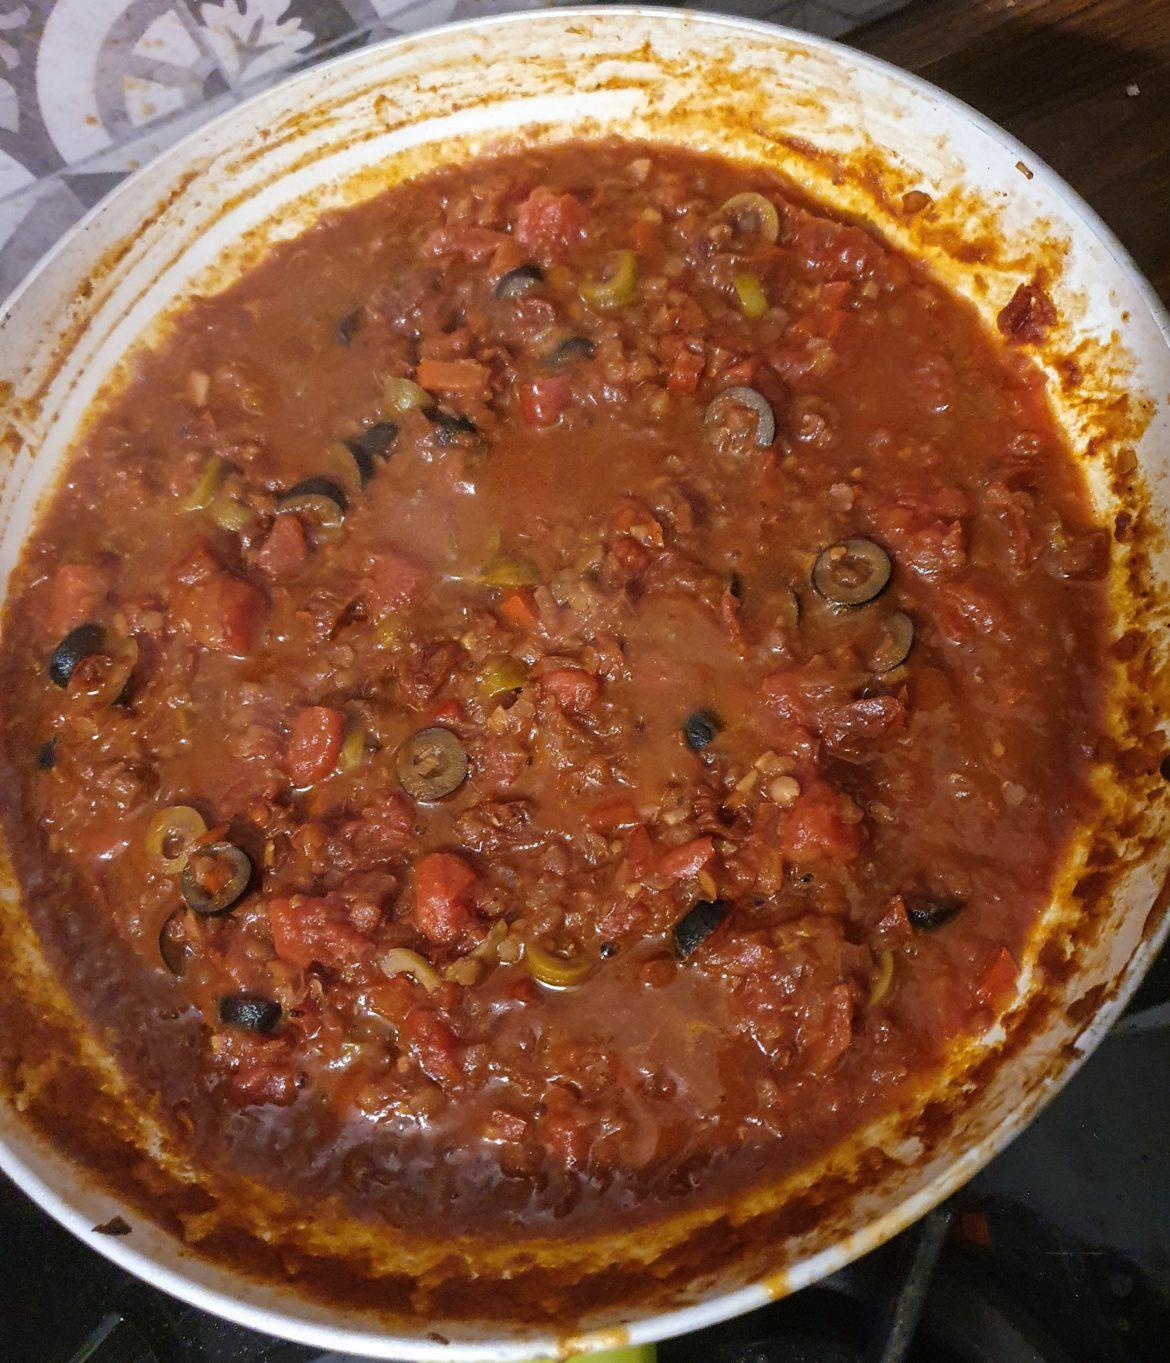 spaghetti alla puttanesca oliwki z winem i pomidorami